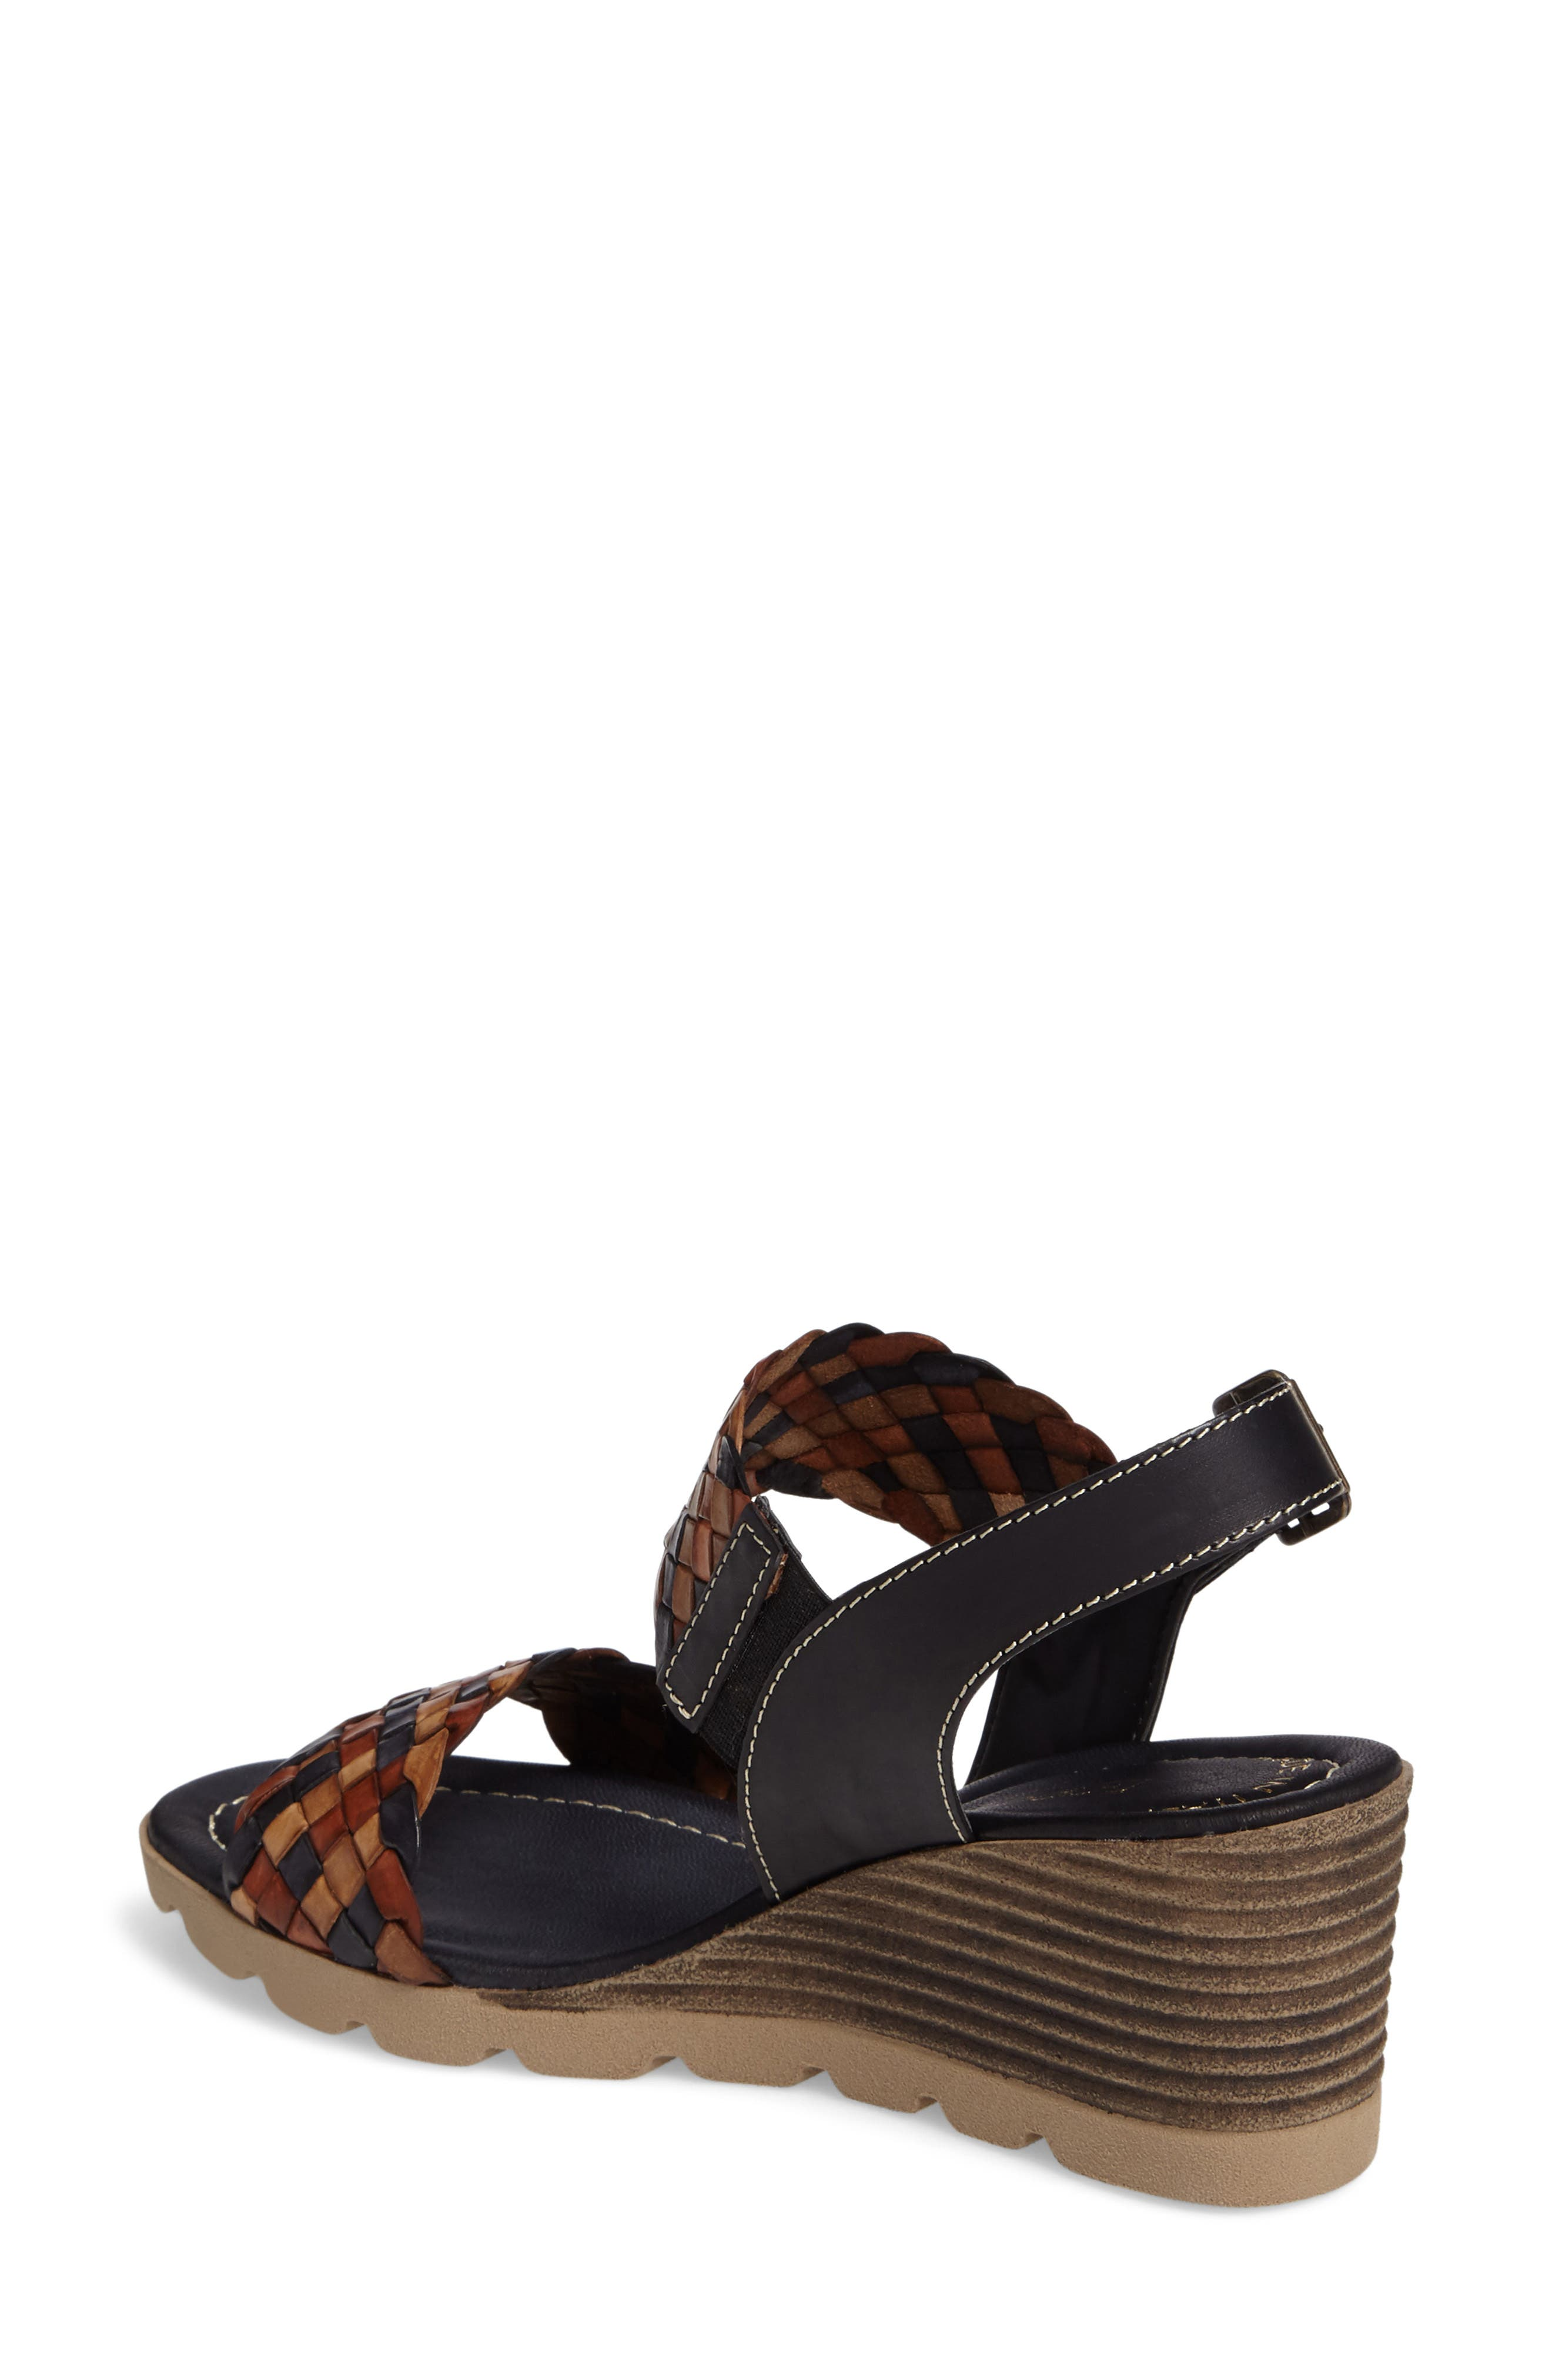 Cool Wedge Sandal,                             Alternate thumbnail 2, color,                             001